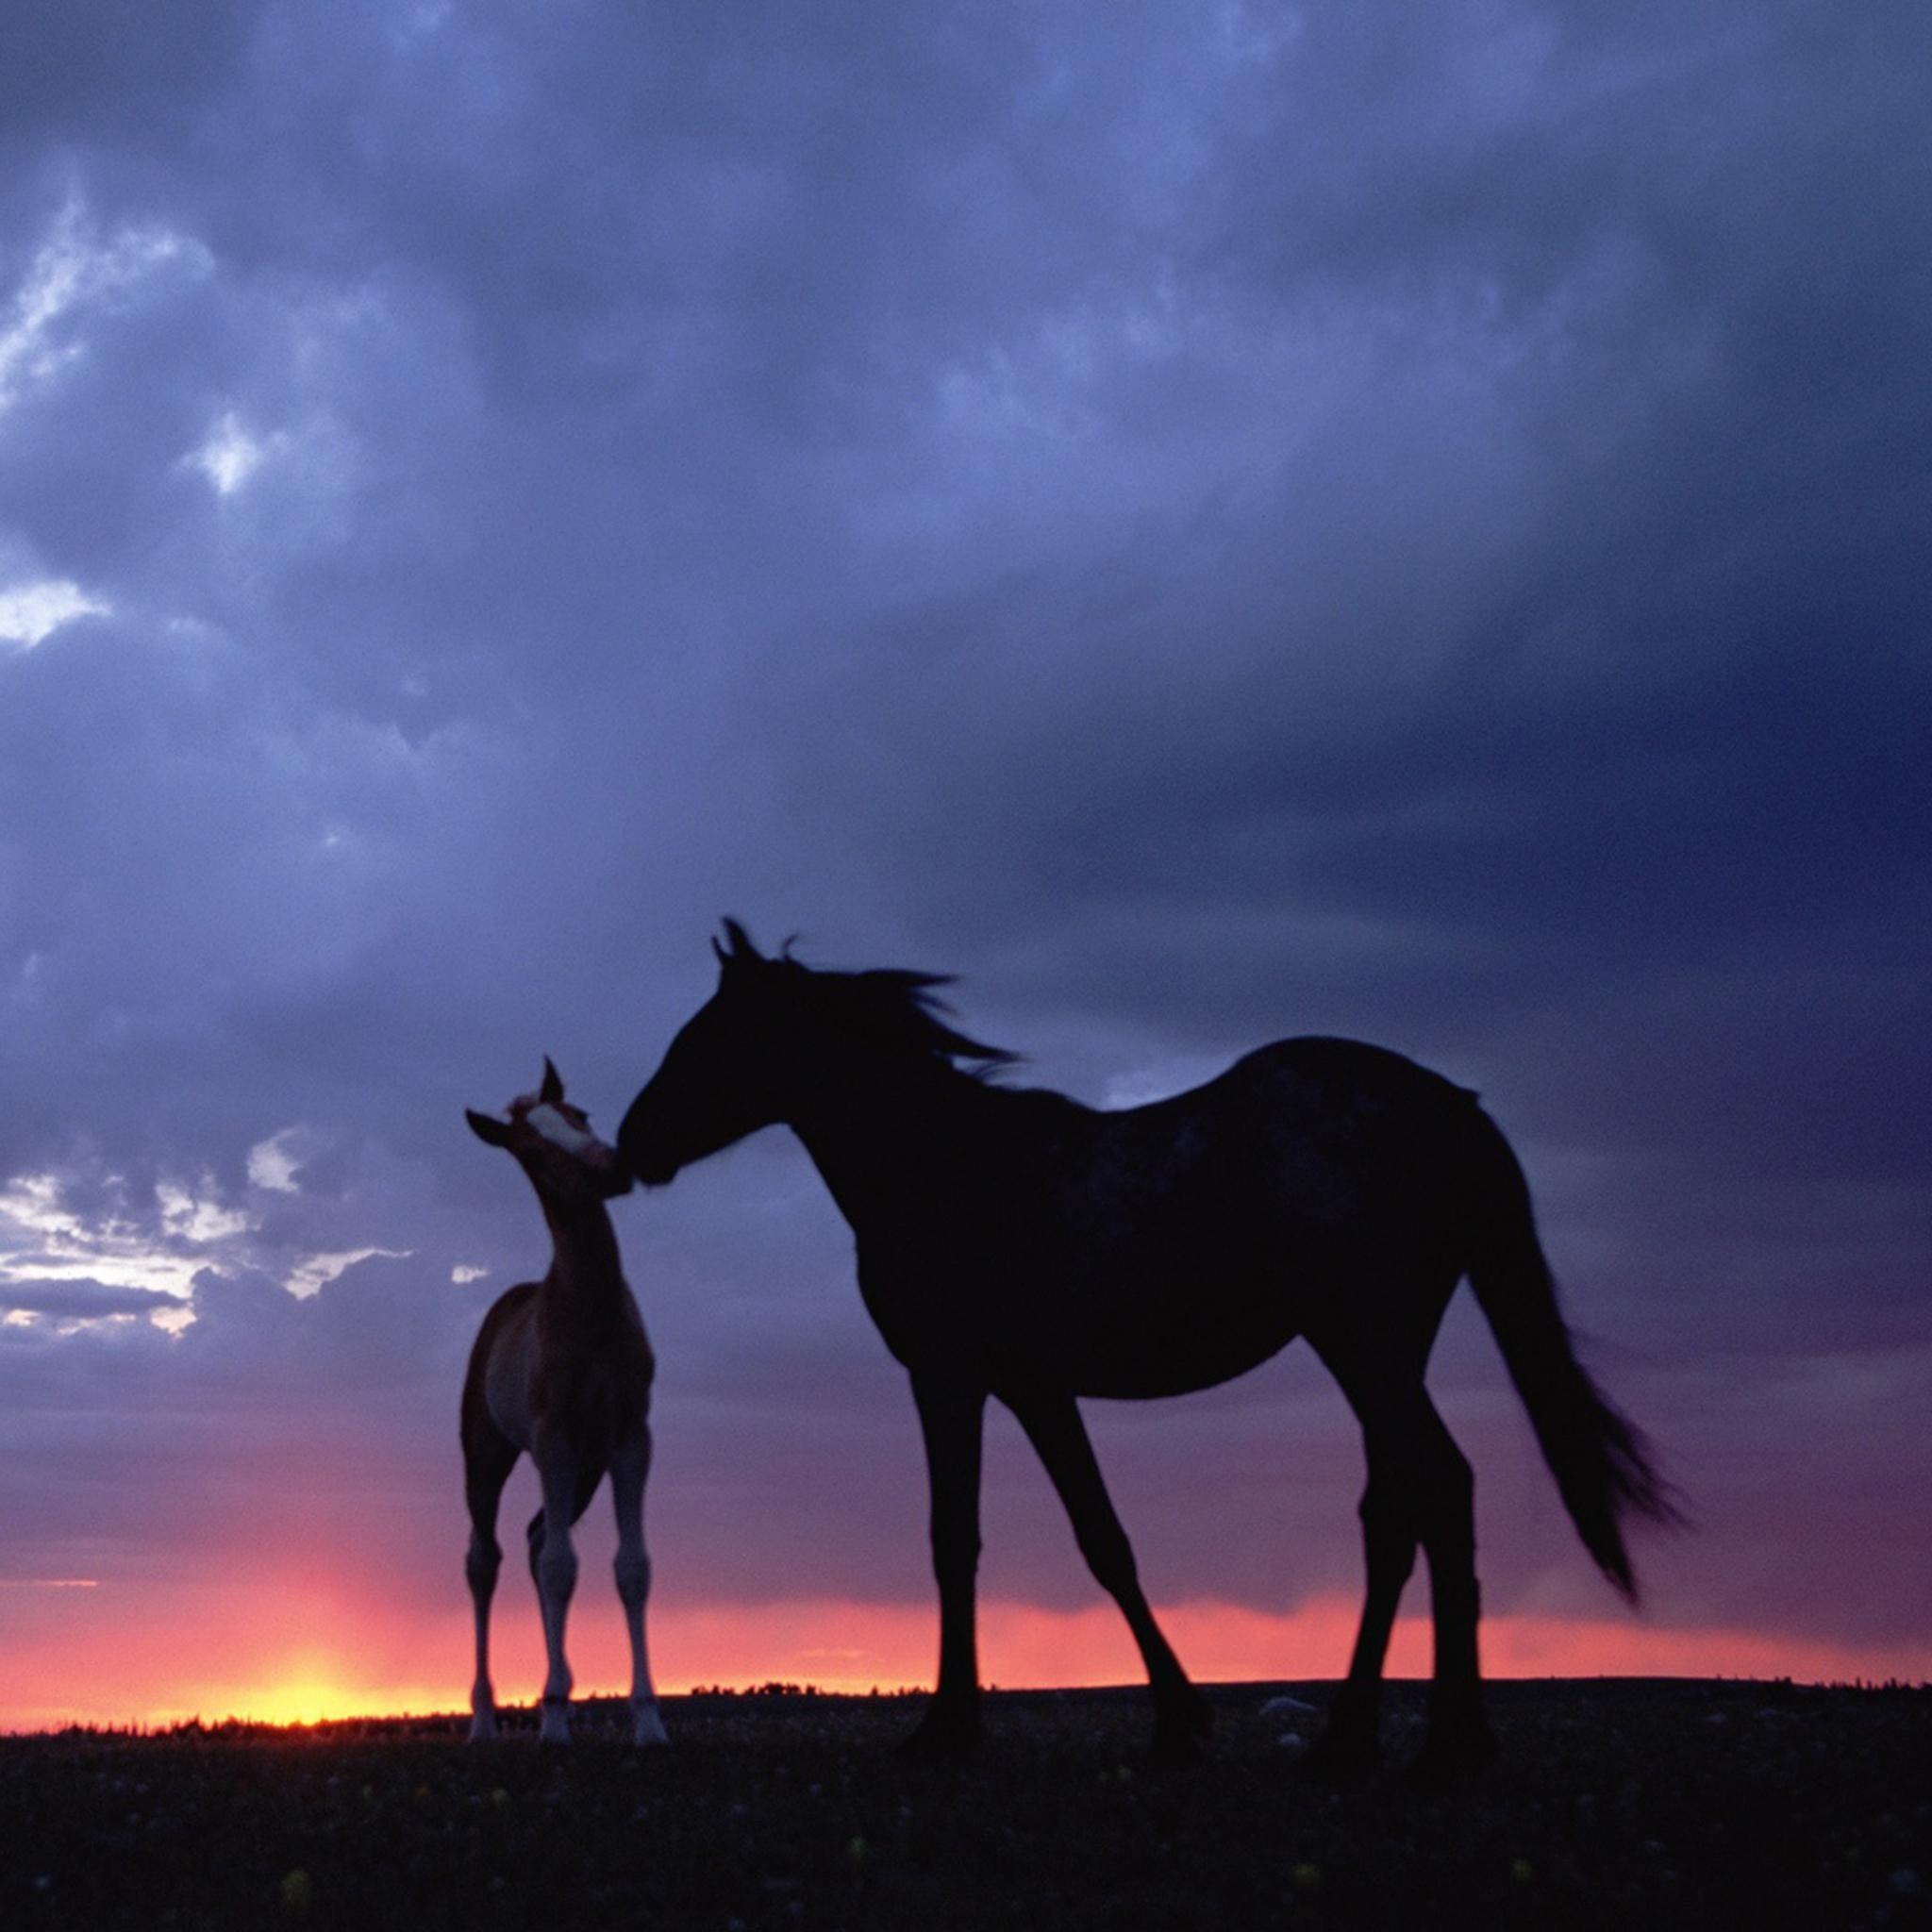 Best Horse Ipad Air Wallpapers Hd Ilikewallpaper